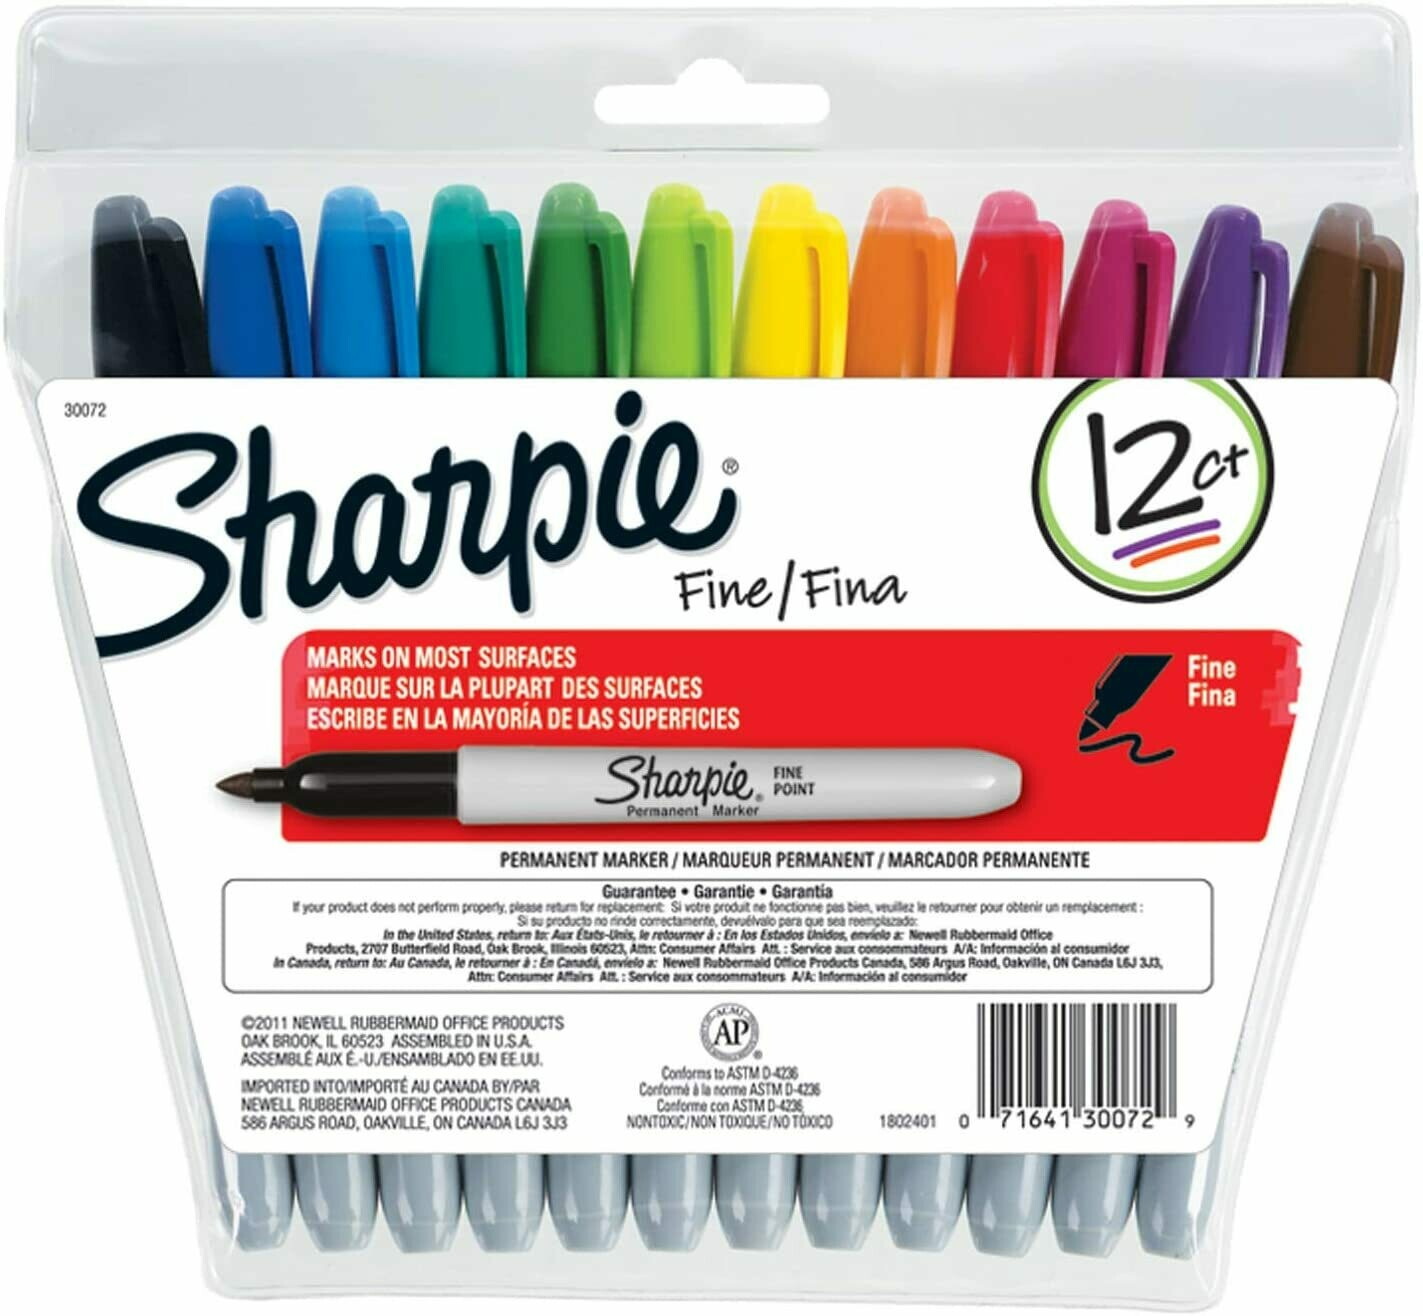 Sharpie Fine Permanent Markers - Set of 12